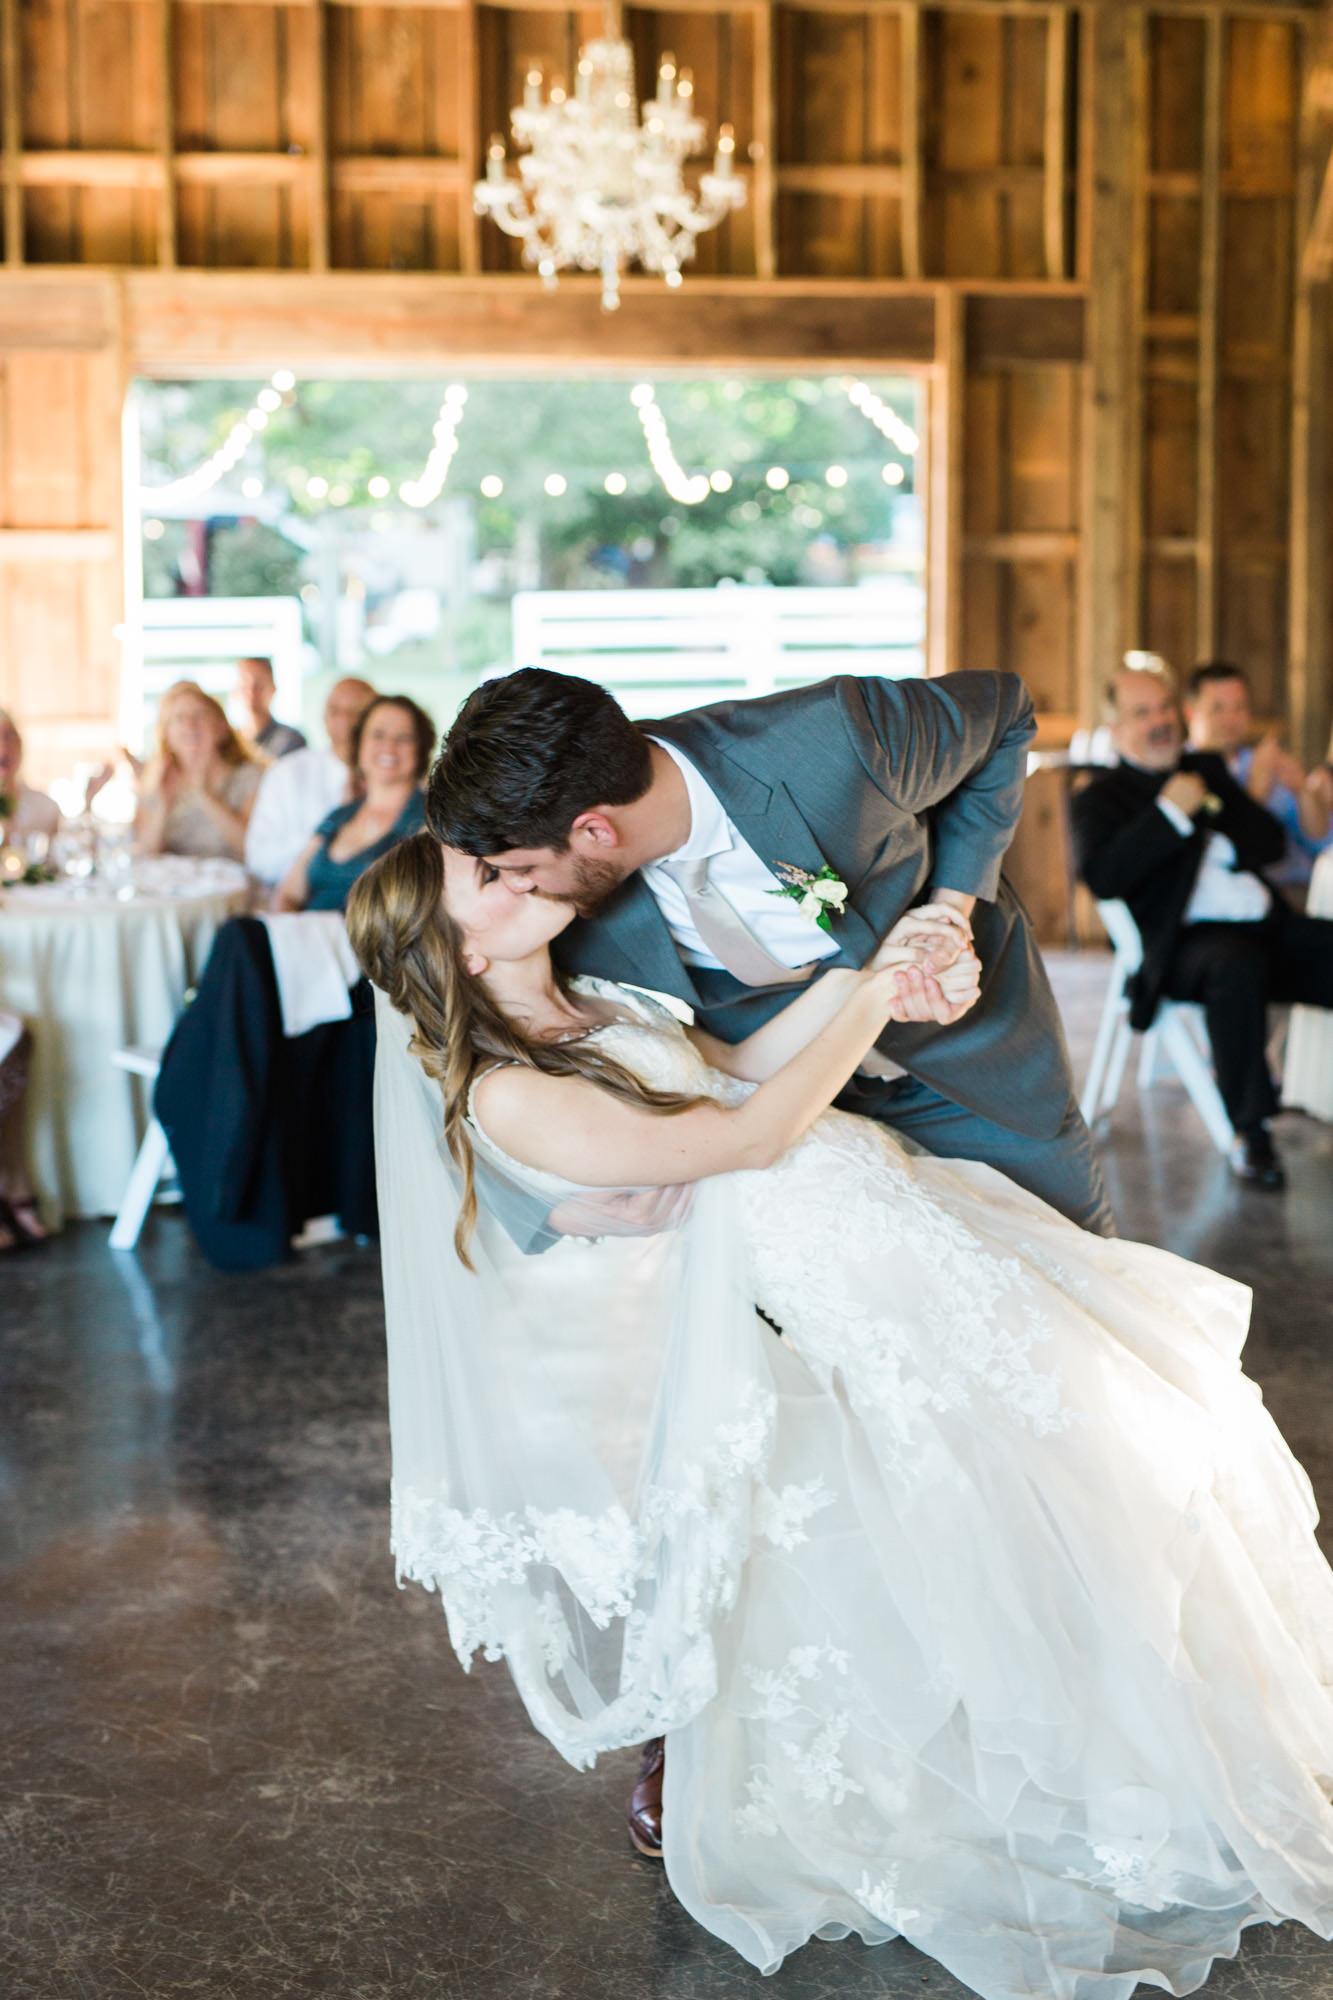 Athens-wedding-reception-kiss-50.jpg